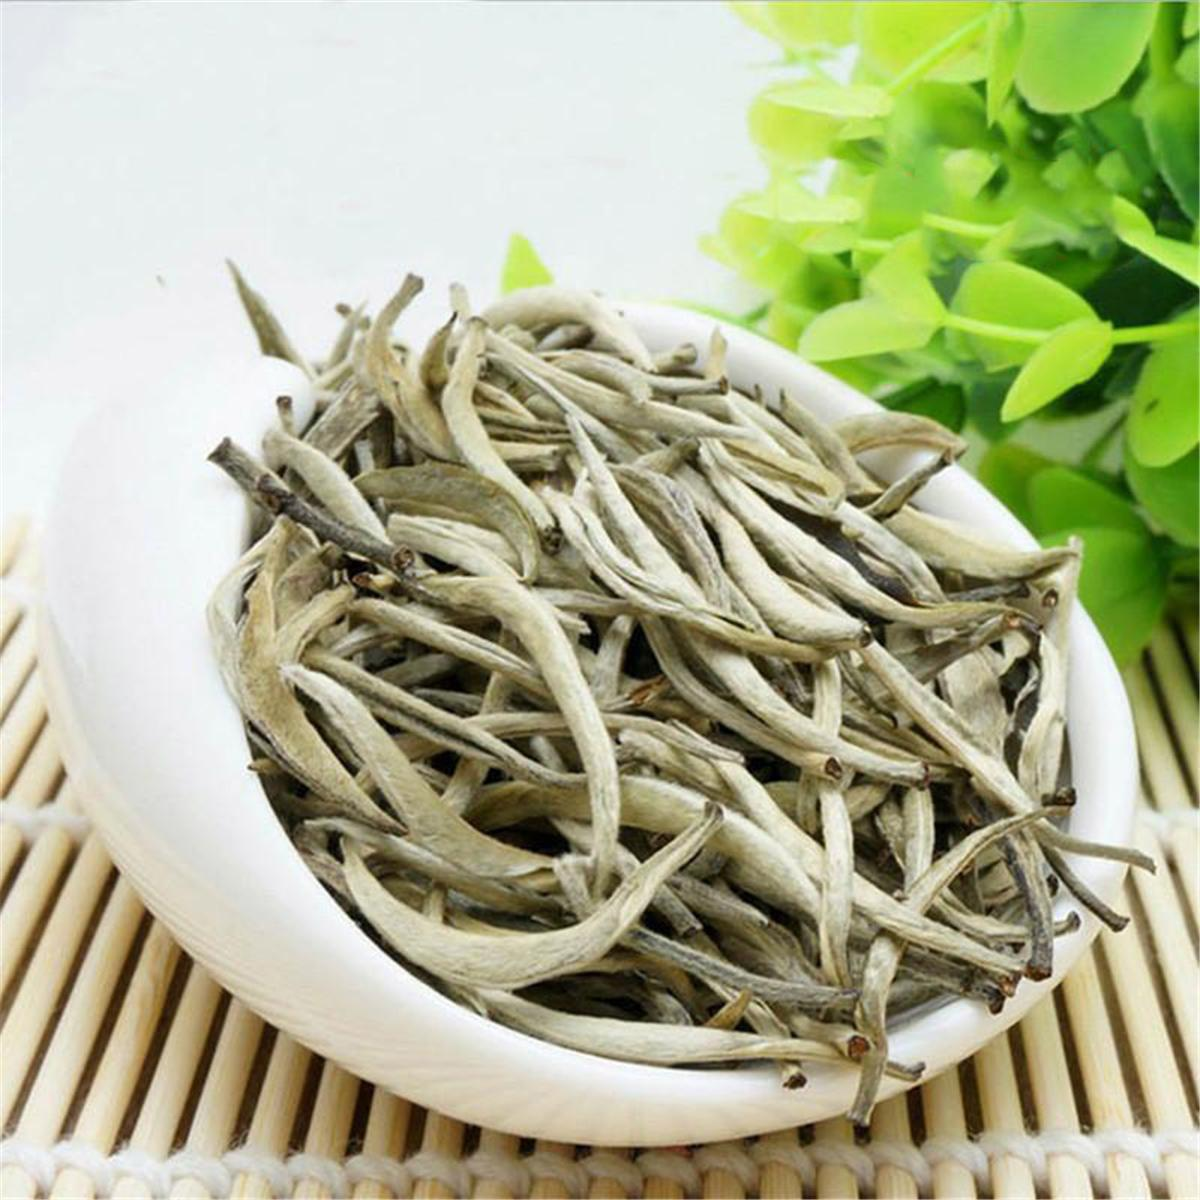 100g Raw Puer Tea Yunnan Silver Needle Loose White Puer Tea Organic Pu'er Old Tree Green Puer Natural Puerh Tea Factory Direct Sales